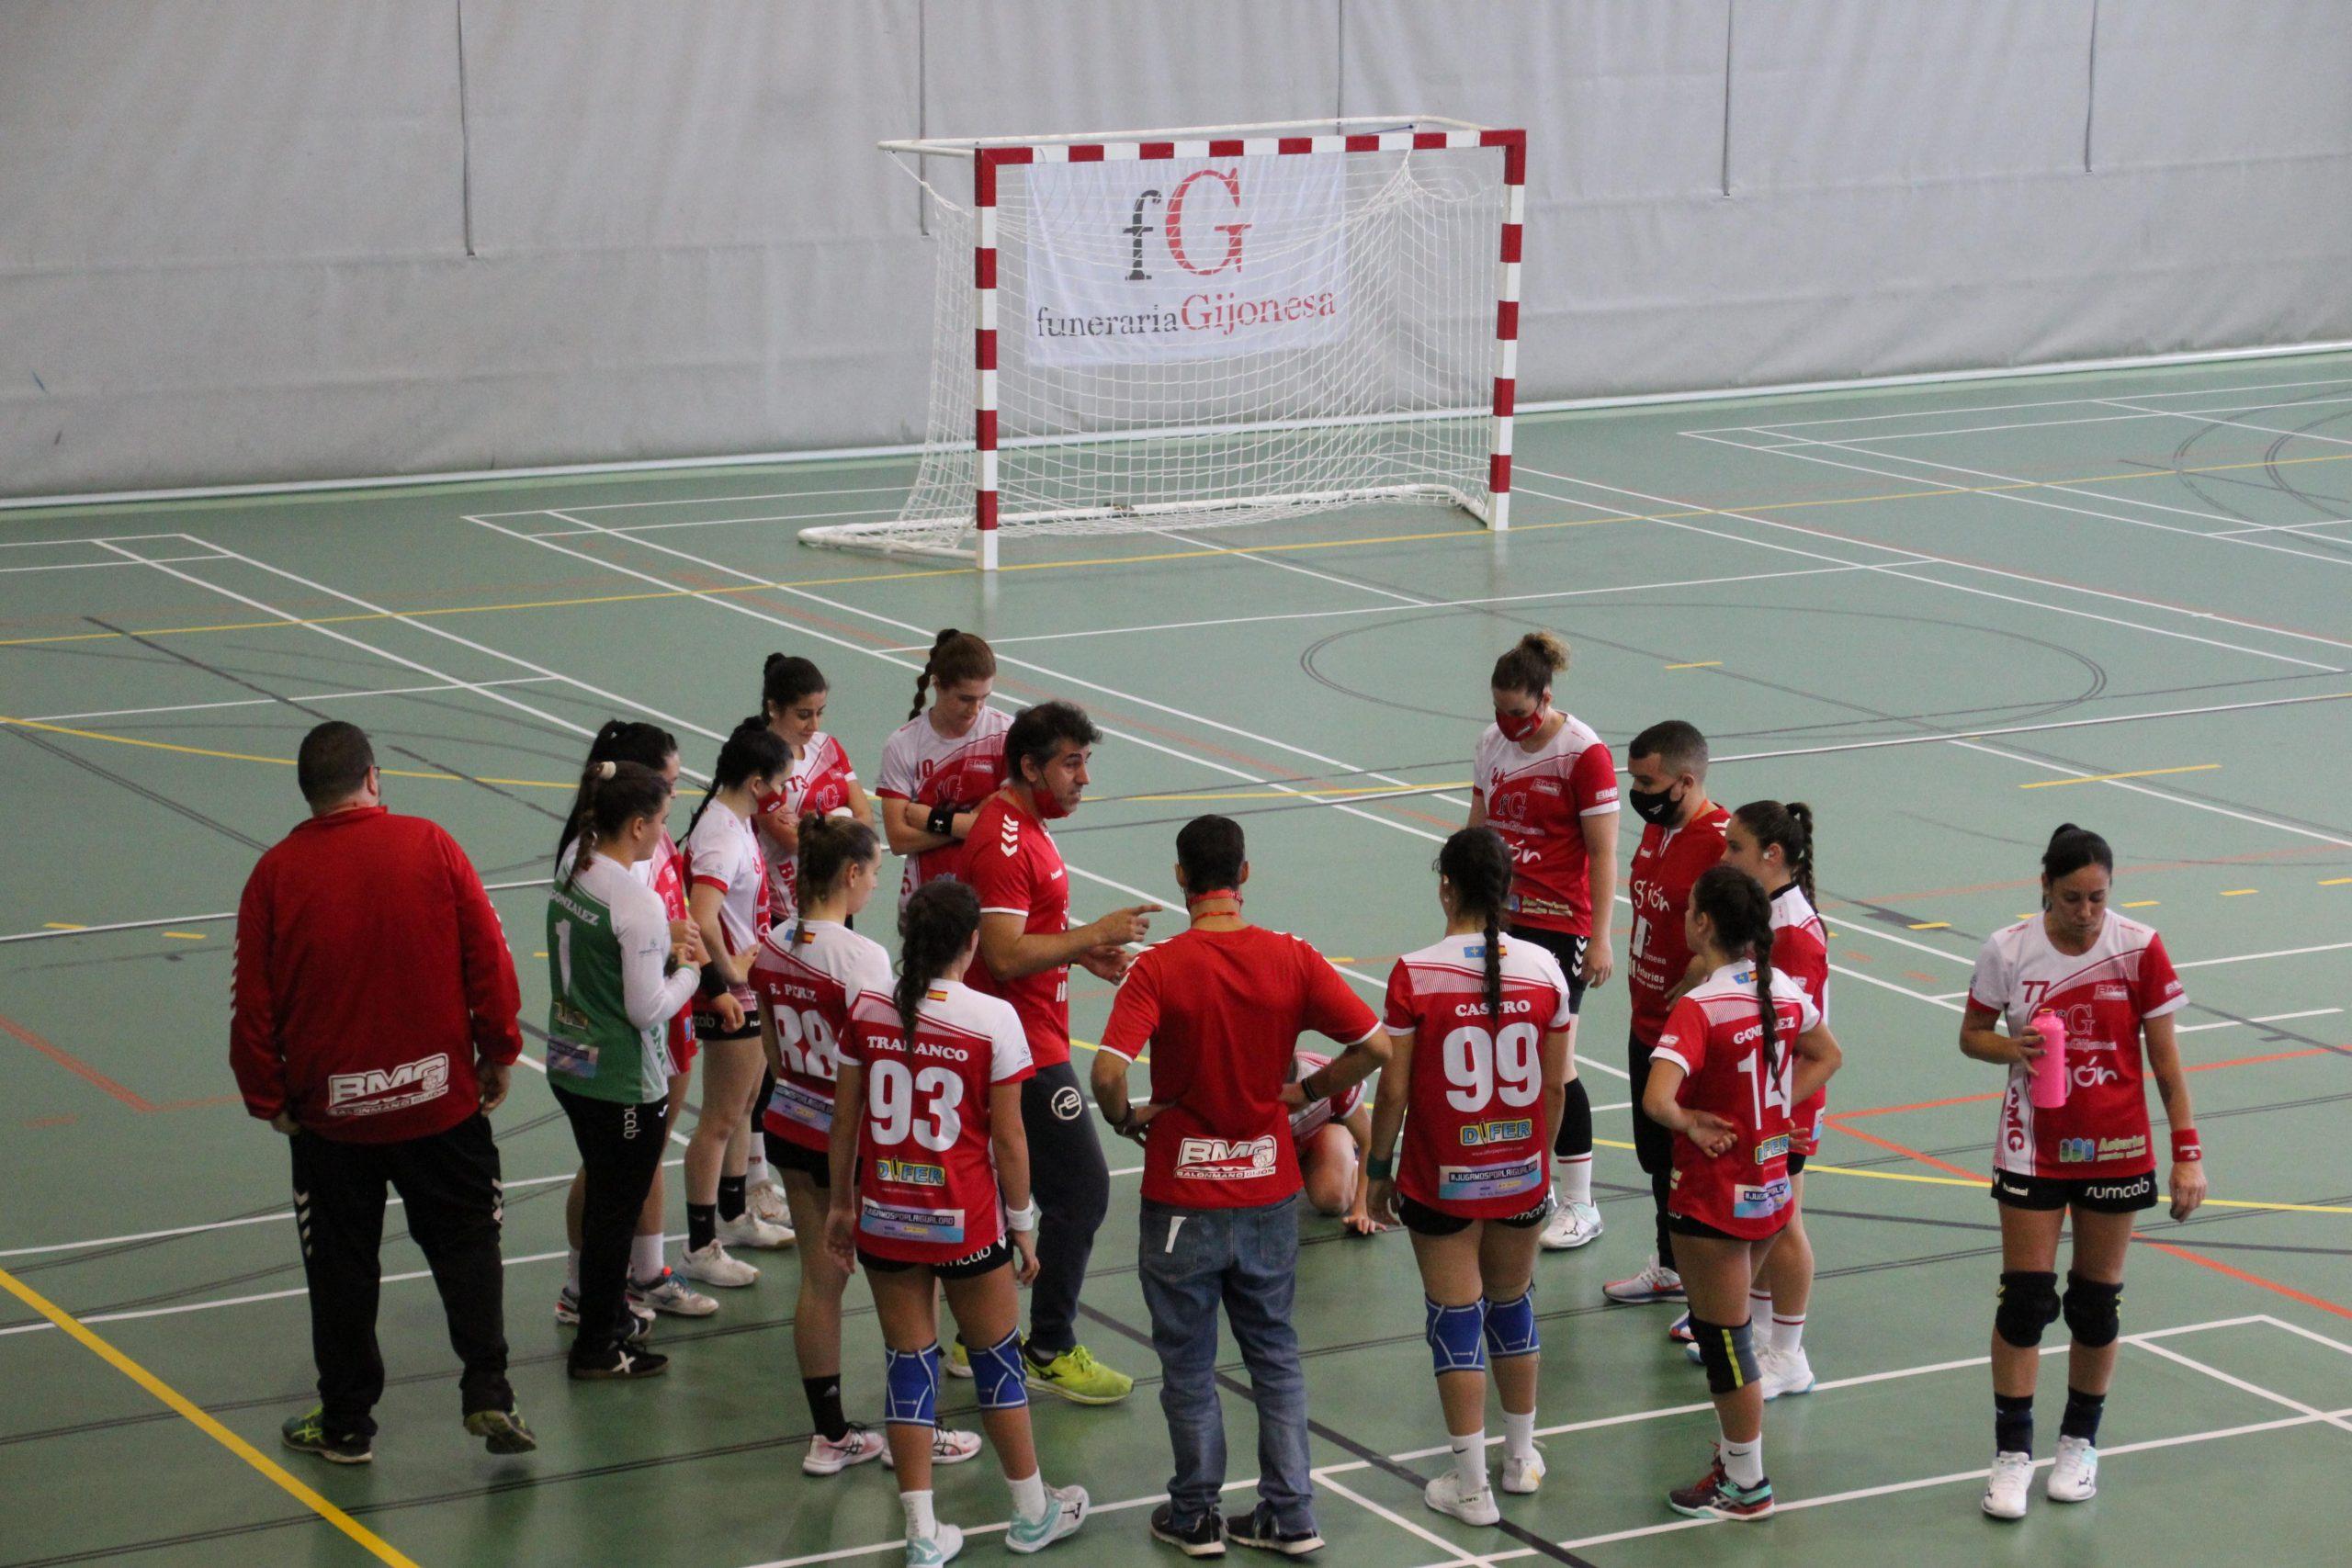 Balonmano Gijón